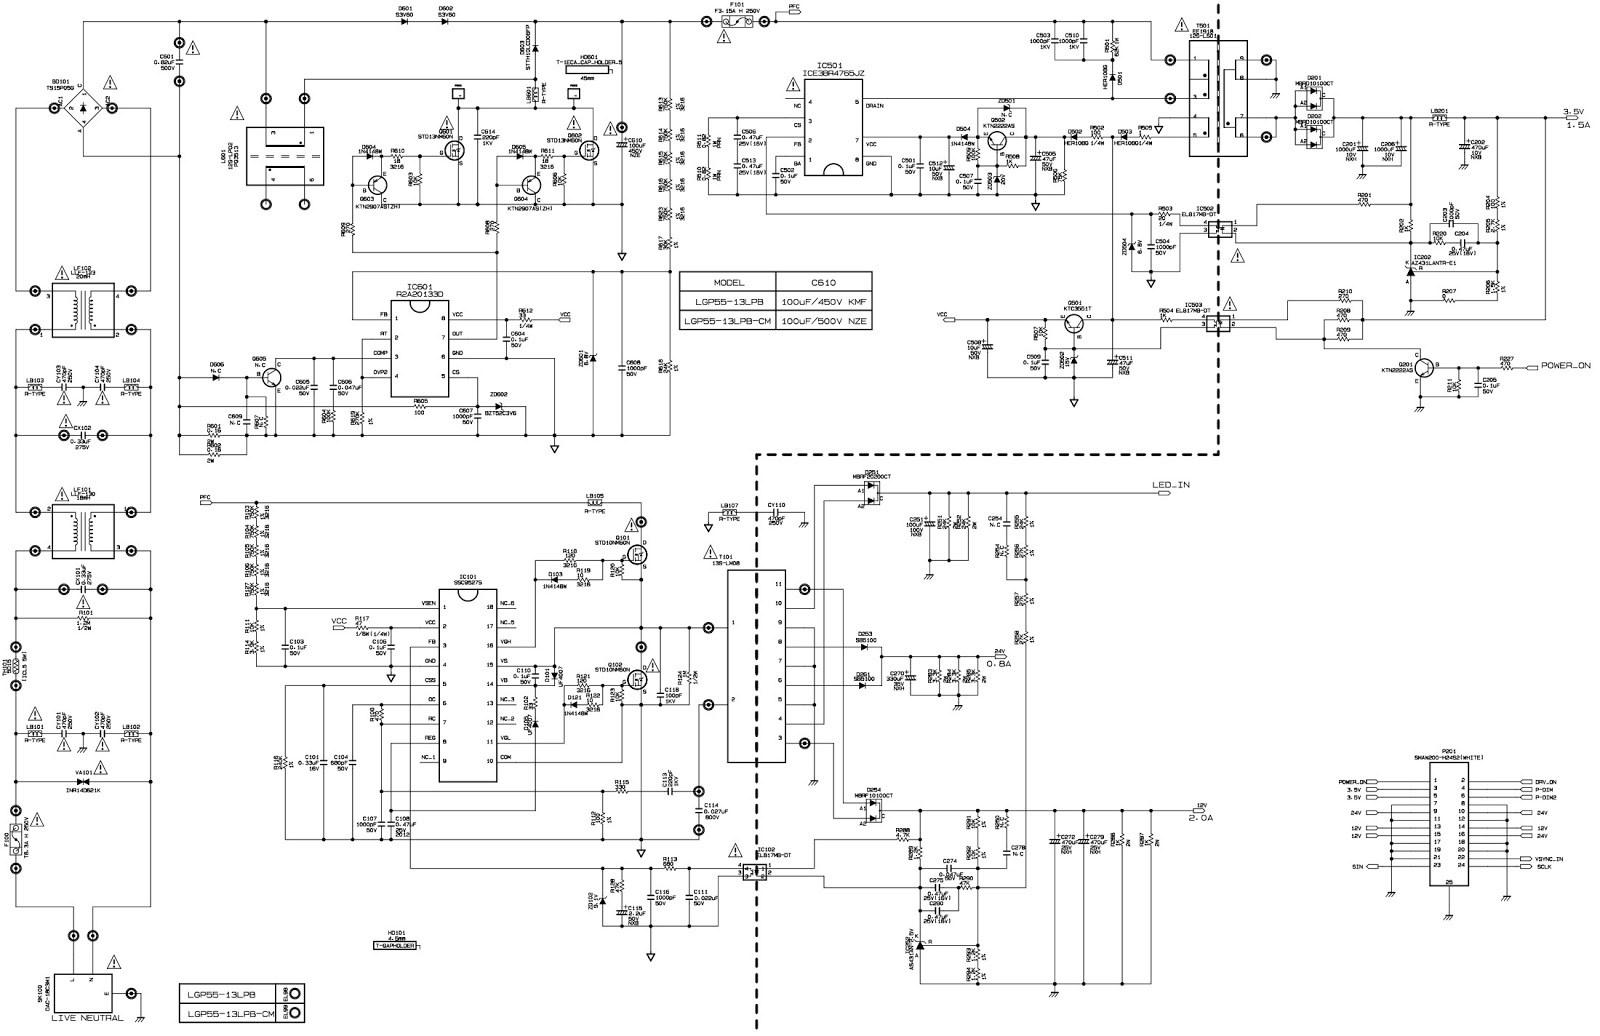 Schematic Diagram Of Power Supply Tv Simple 15v Regulated Circuit Powersupplycircuit Lg Wiring